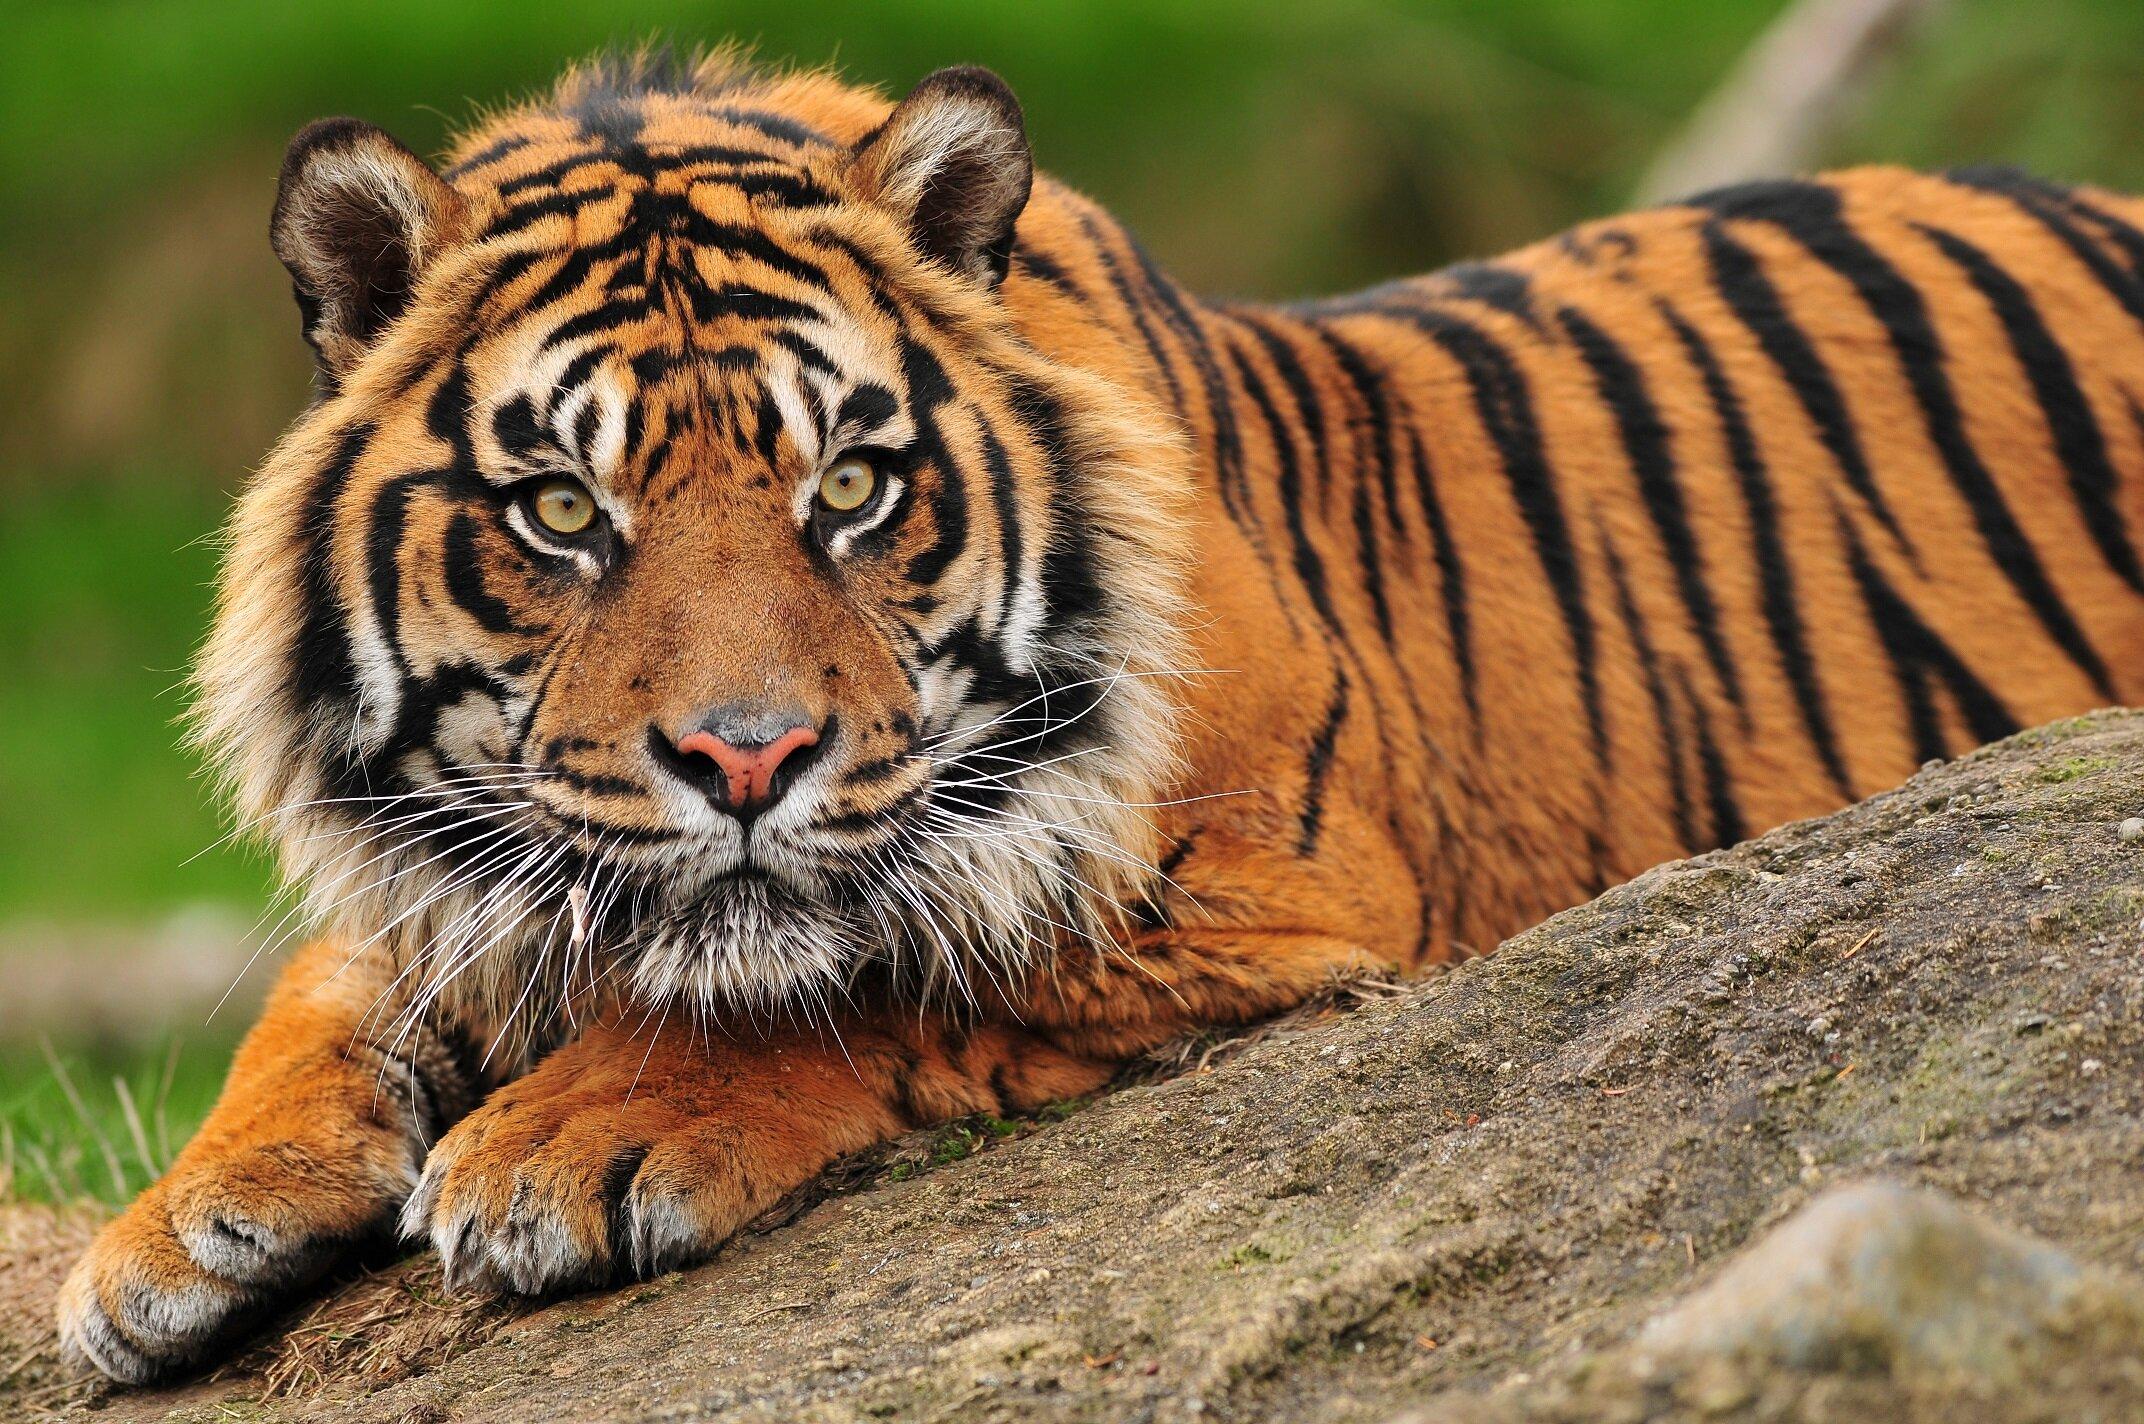 Using Digital Cameras For Basic Health Checks Saves Zoo Animals From Anesthetics